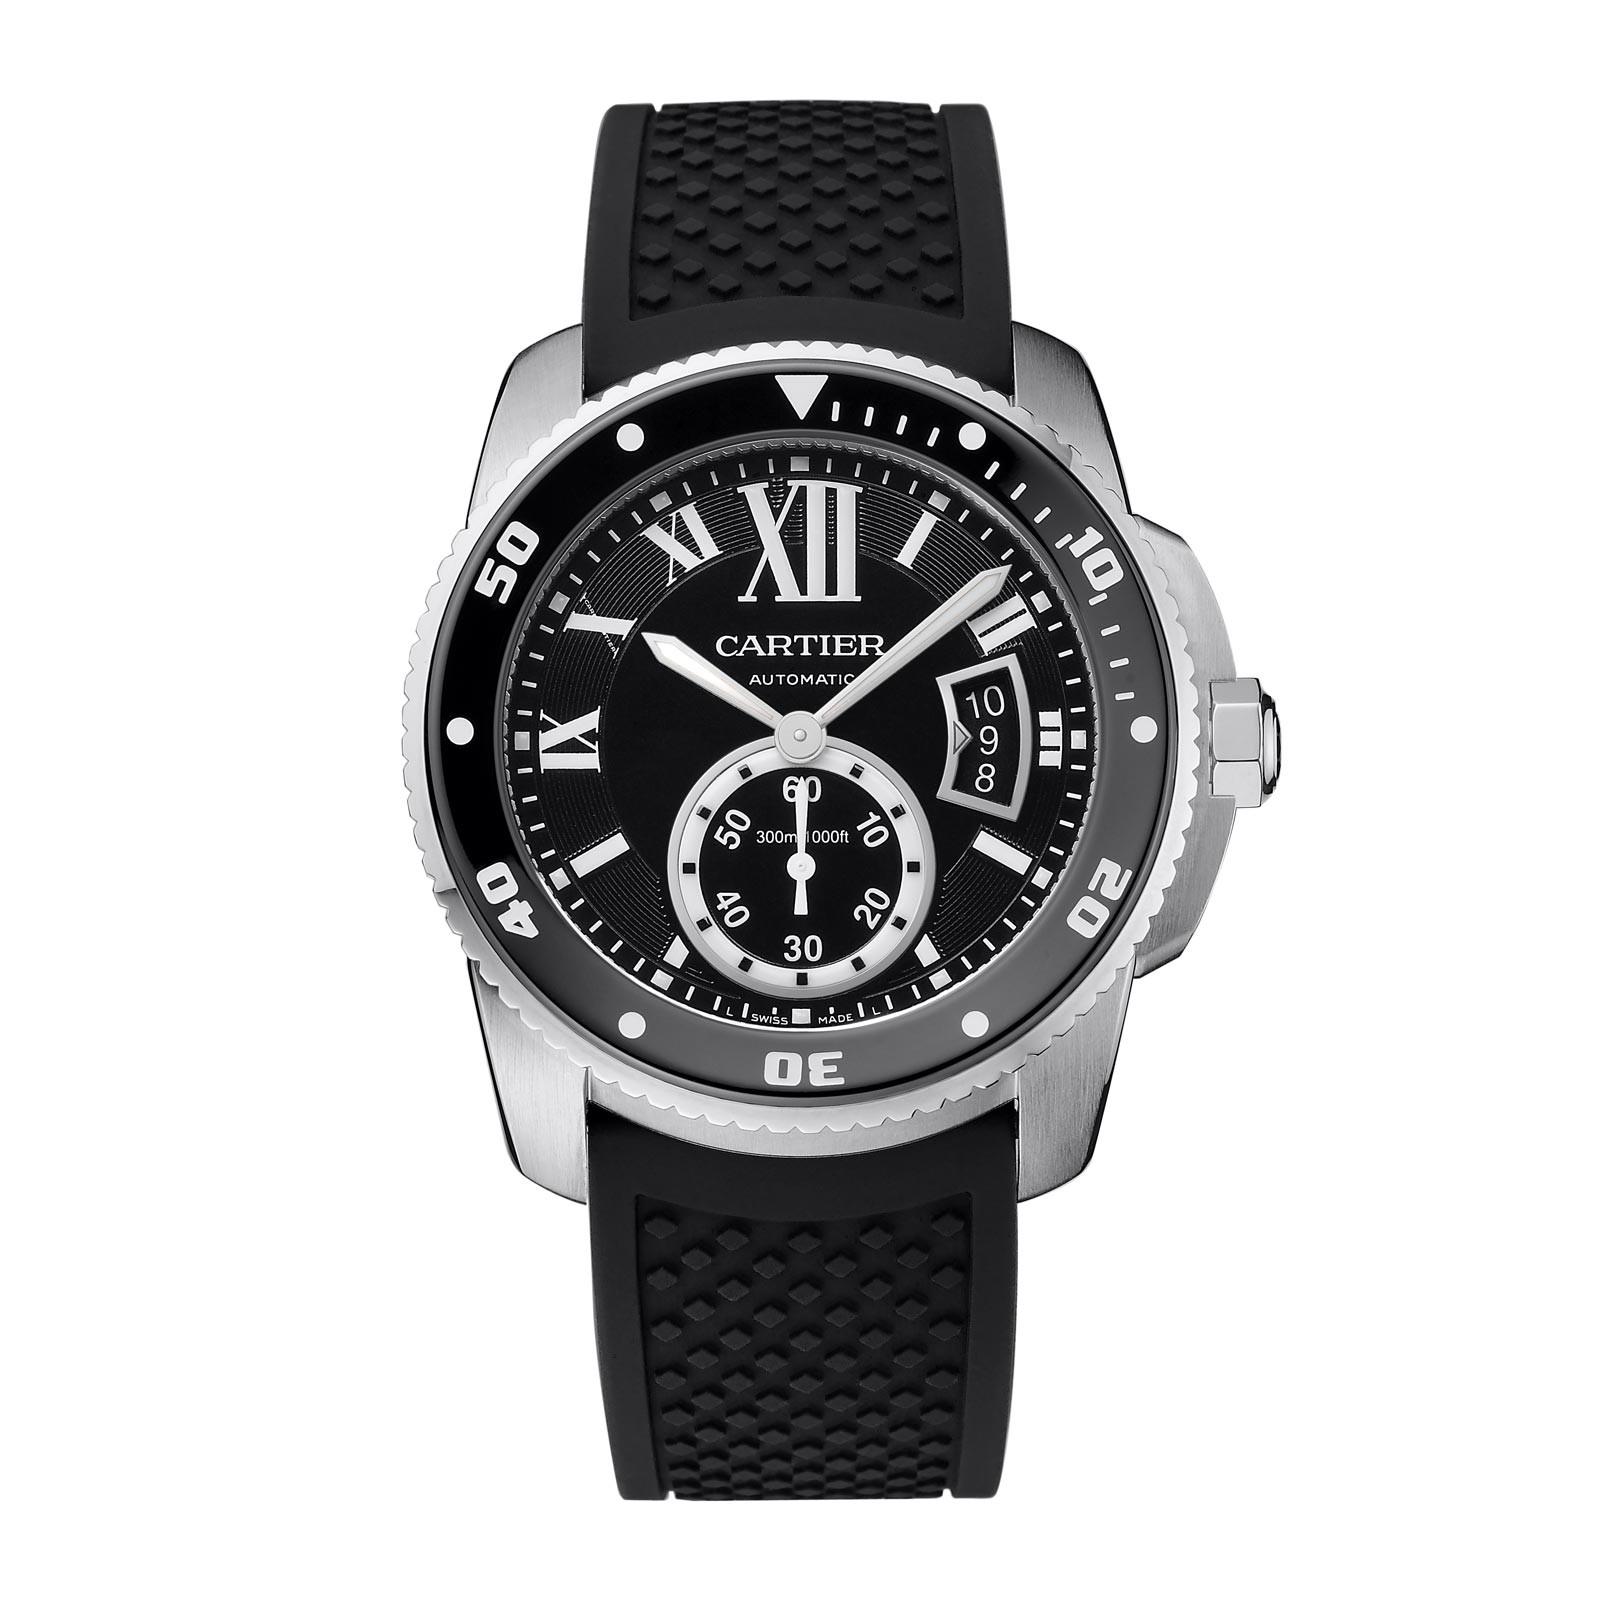 Front of Cartier Calibre de watch for diver